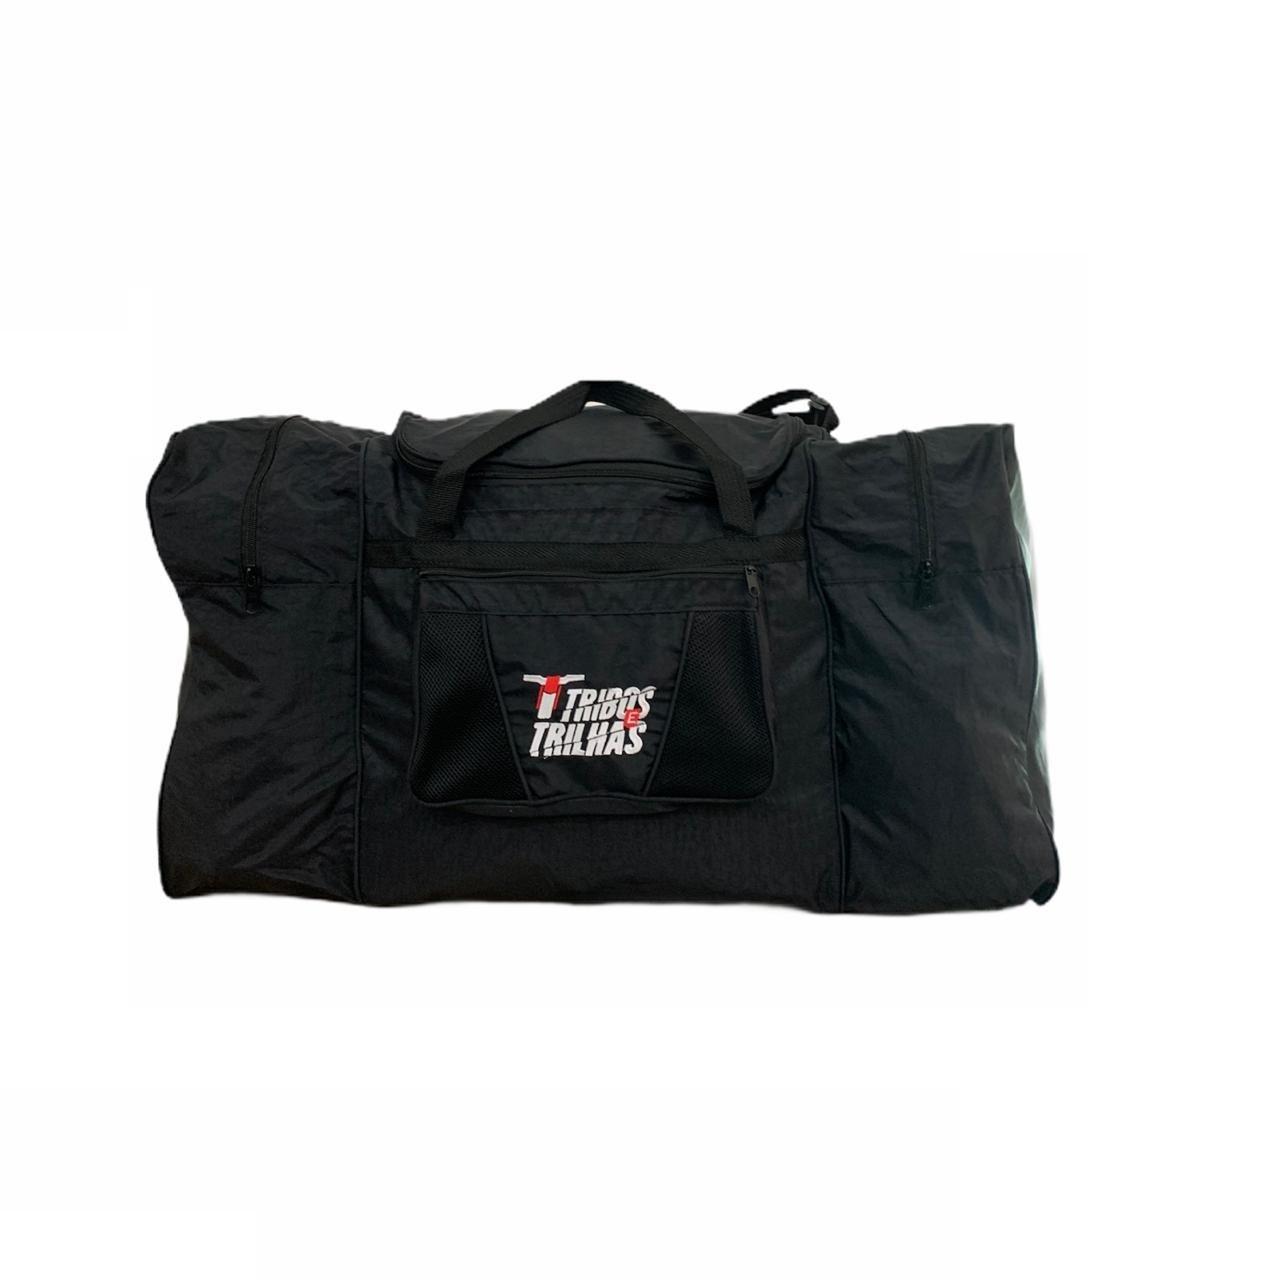 Kit Bolsa de Equipamento + Pochete Tribos e Trilhas Ride